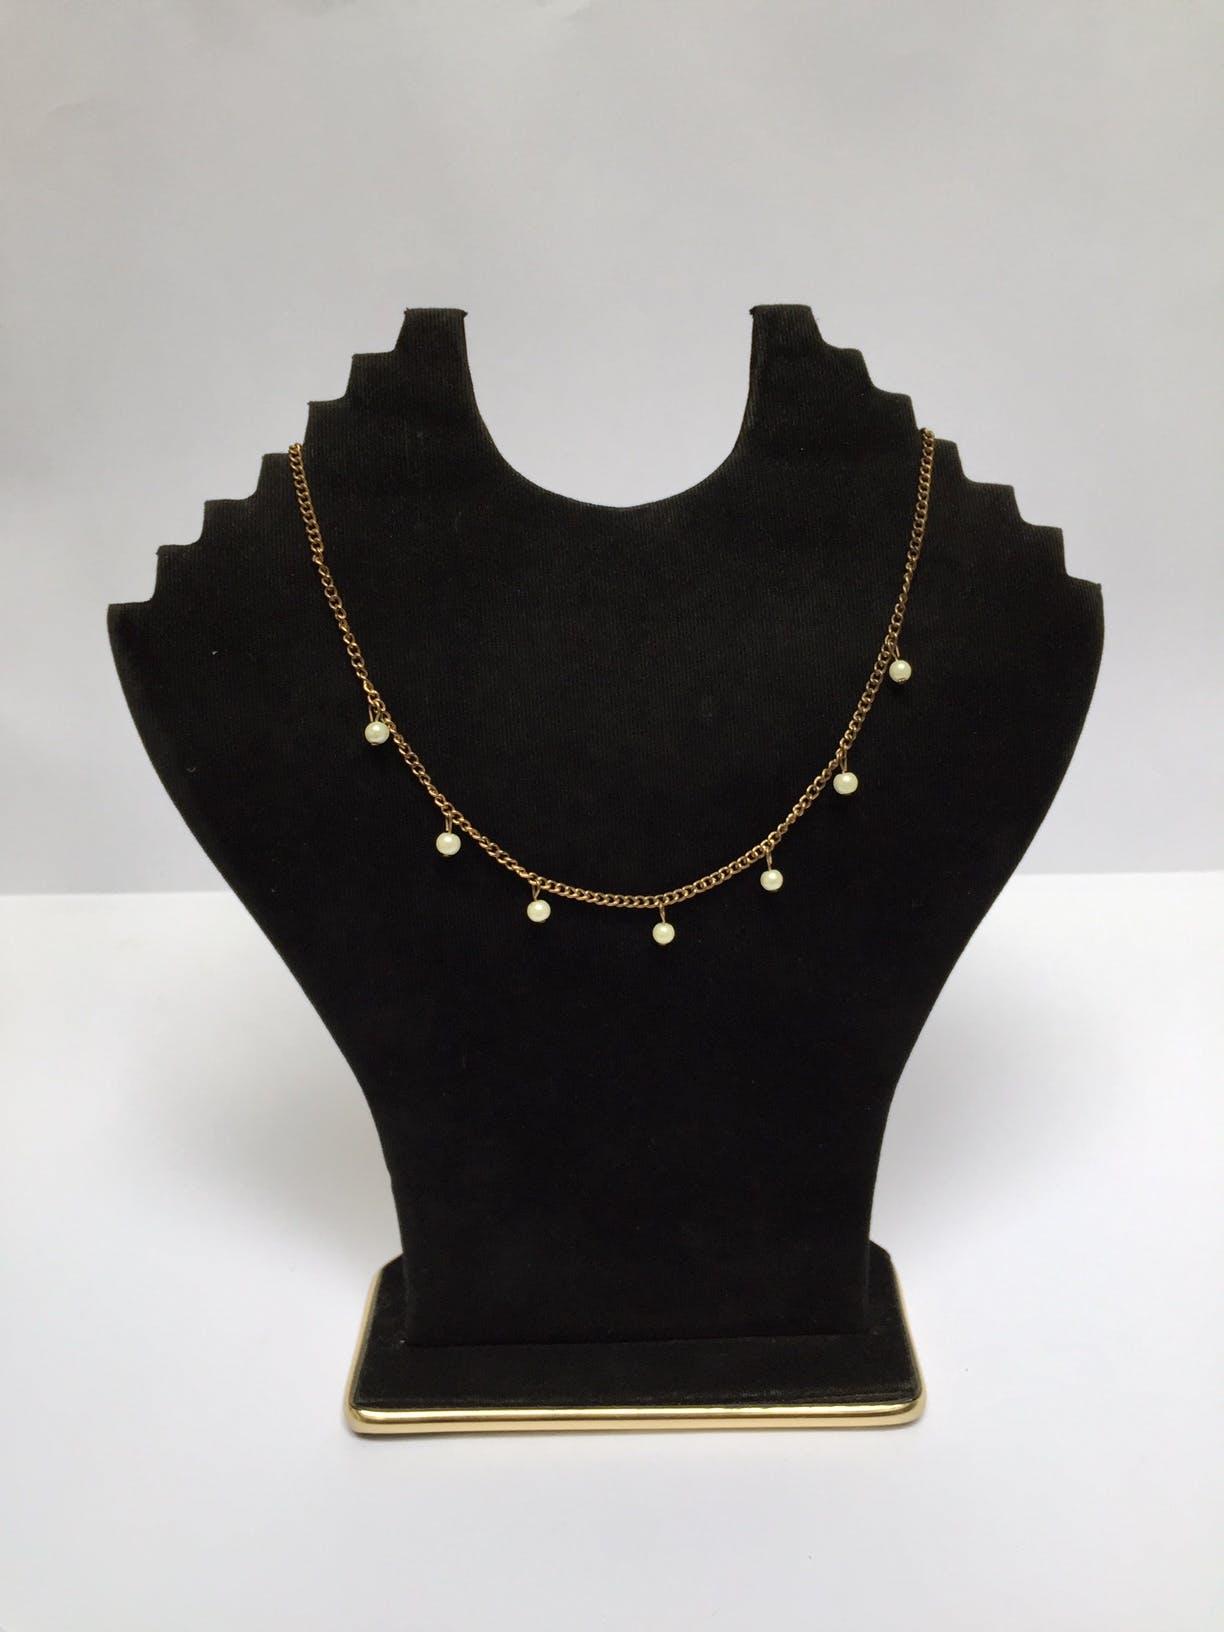 Collar de cadena dorada con perlas colgando Circunferencia: 41 cm